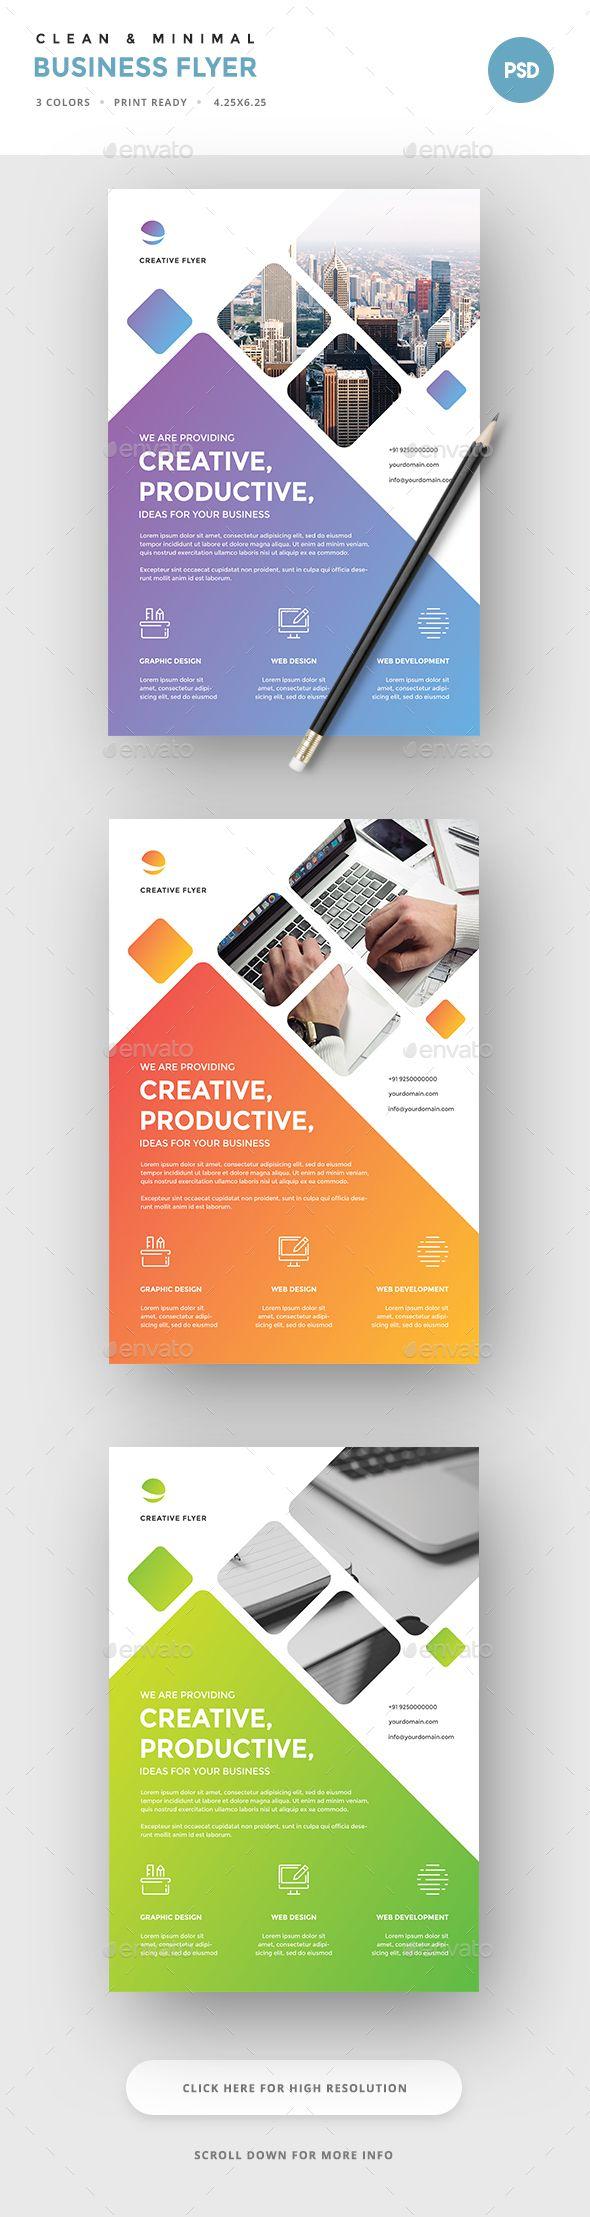 Best 25+ Business flyers ideas on Pinterest | Business flyer ...